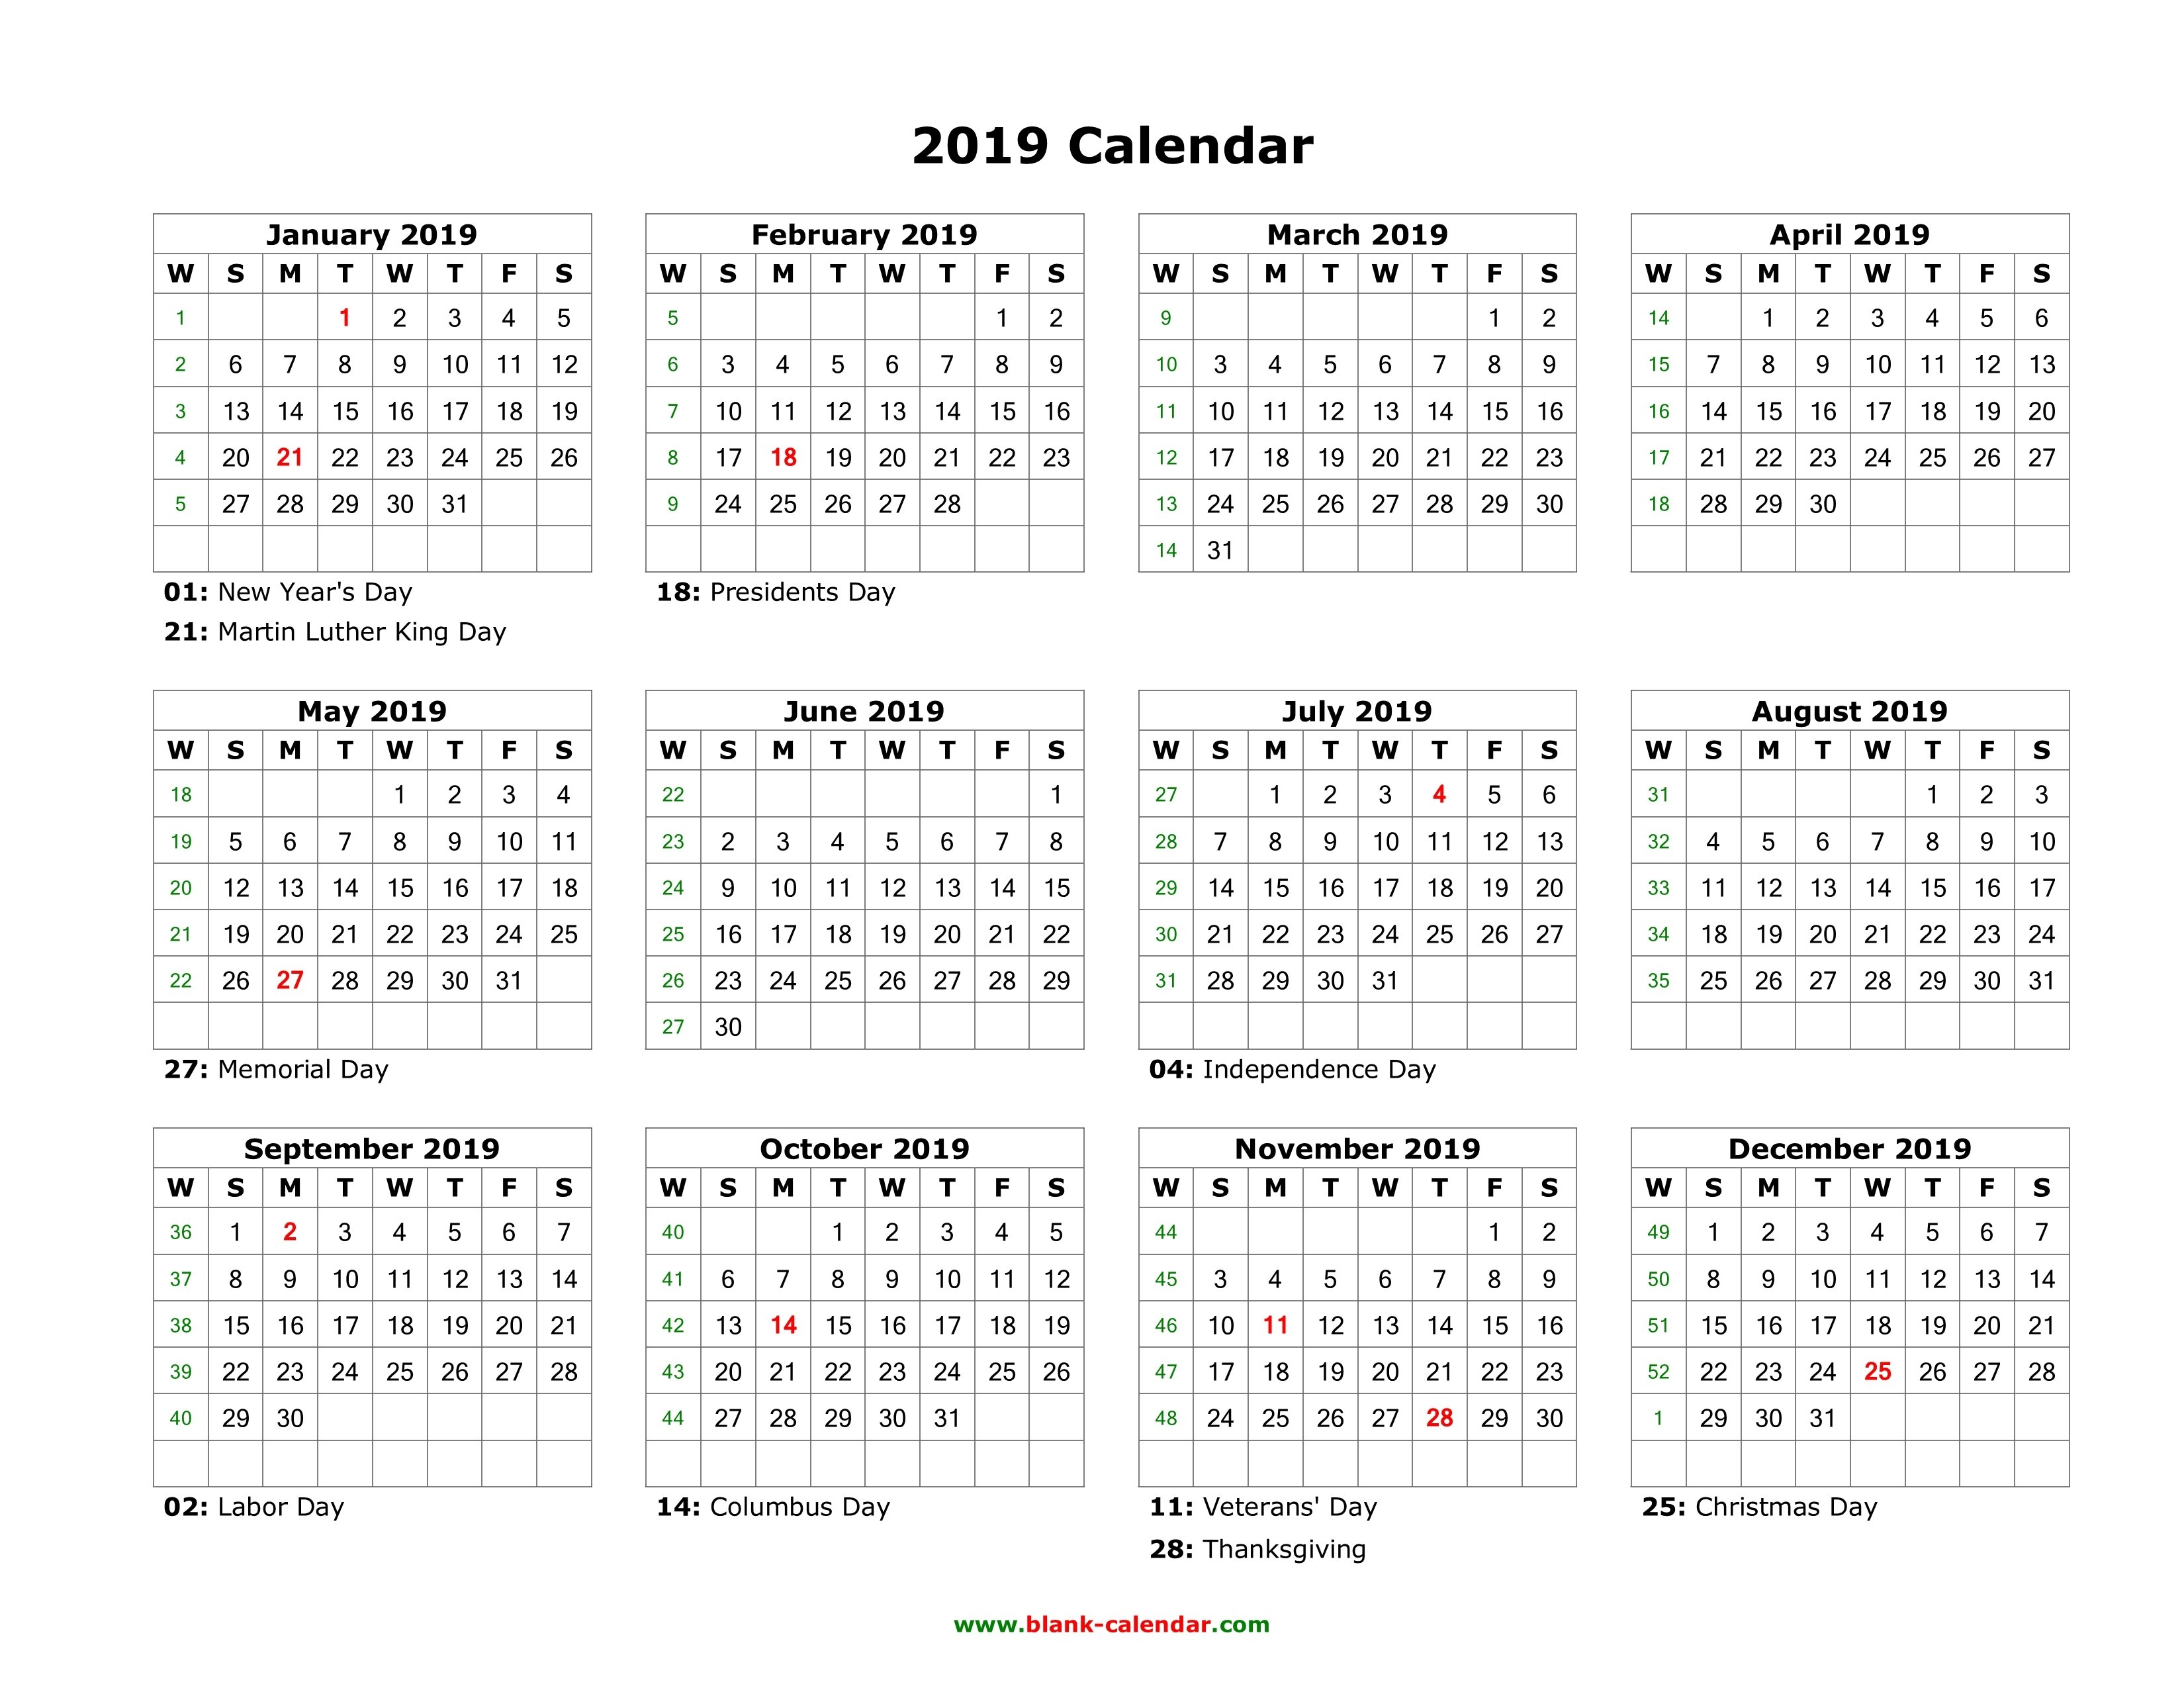 Blank Calendar 2019 | Free Download Calendar Templates 2019 Calendar 12 Pages